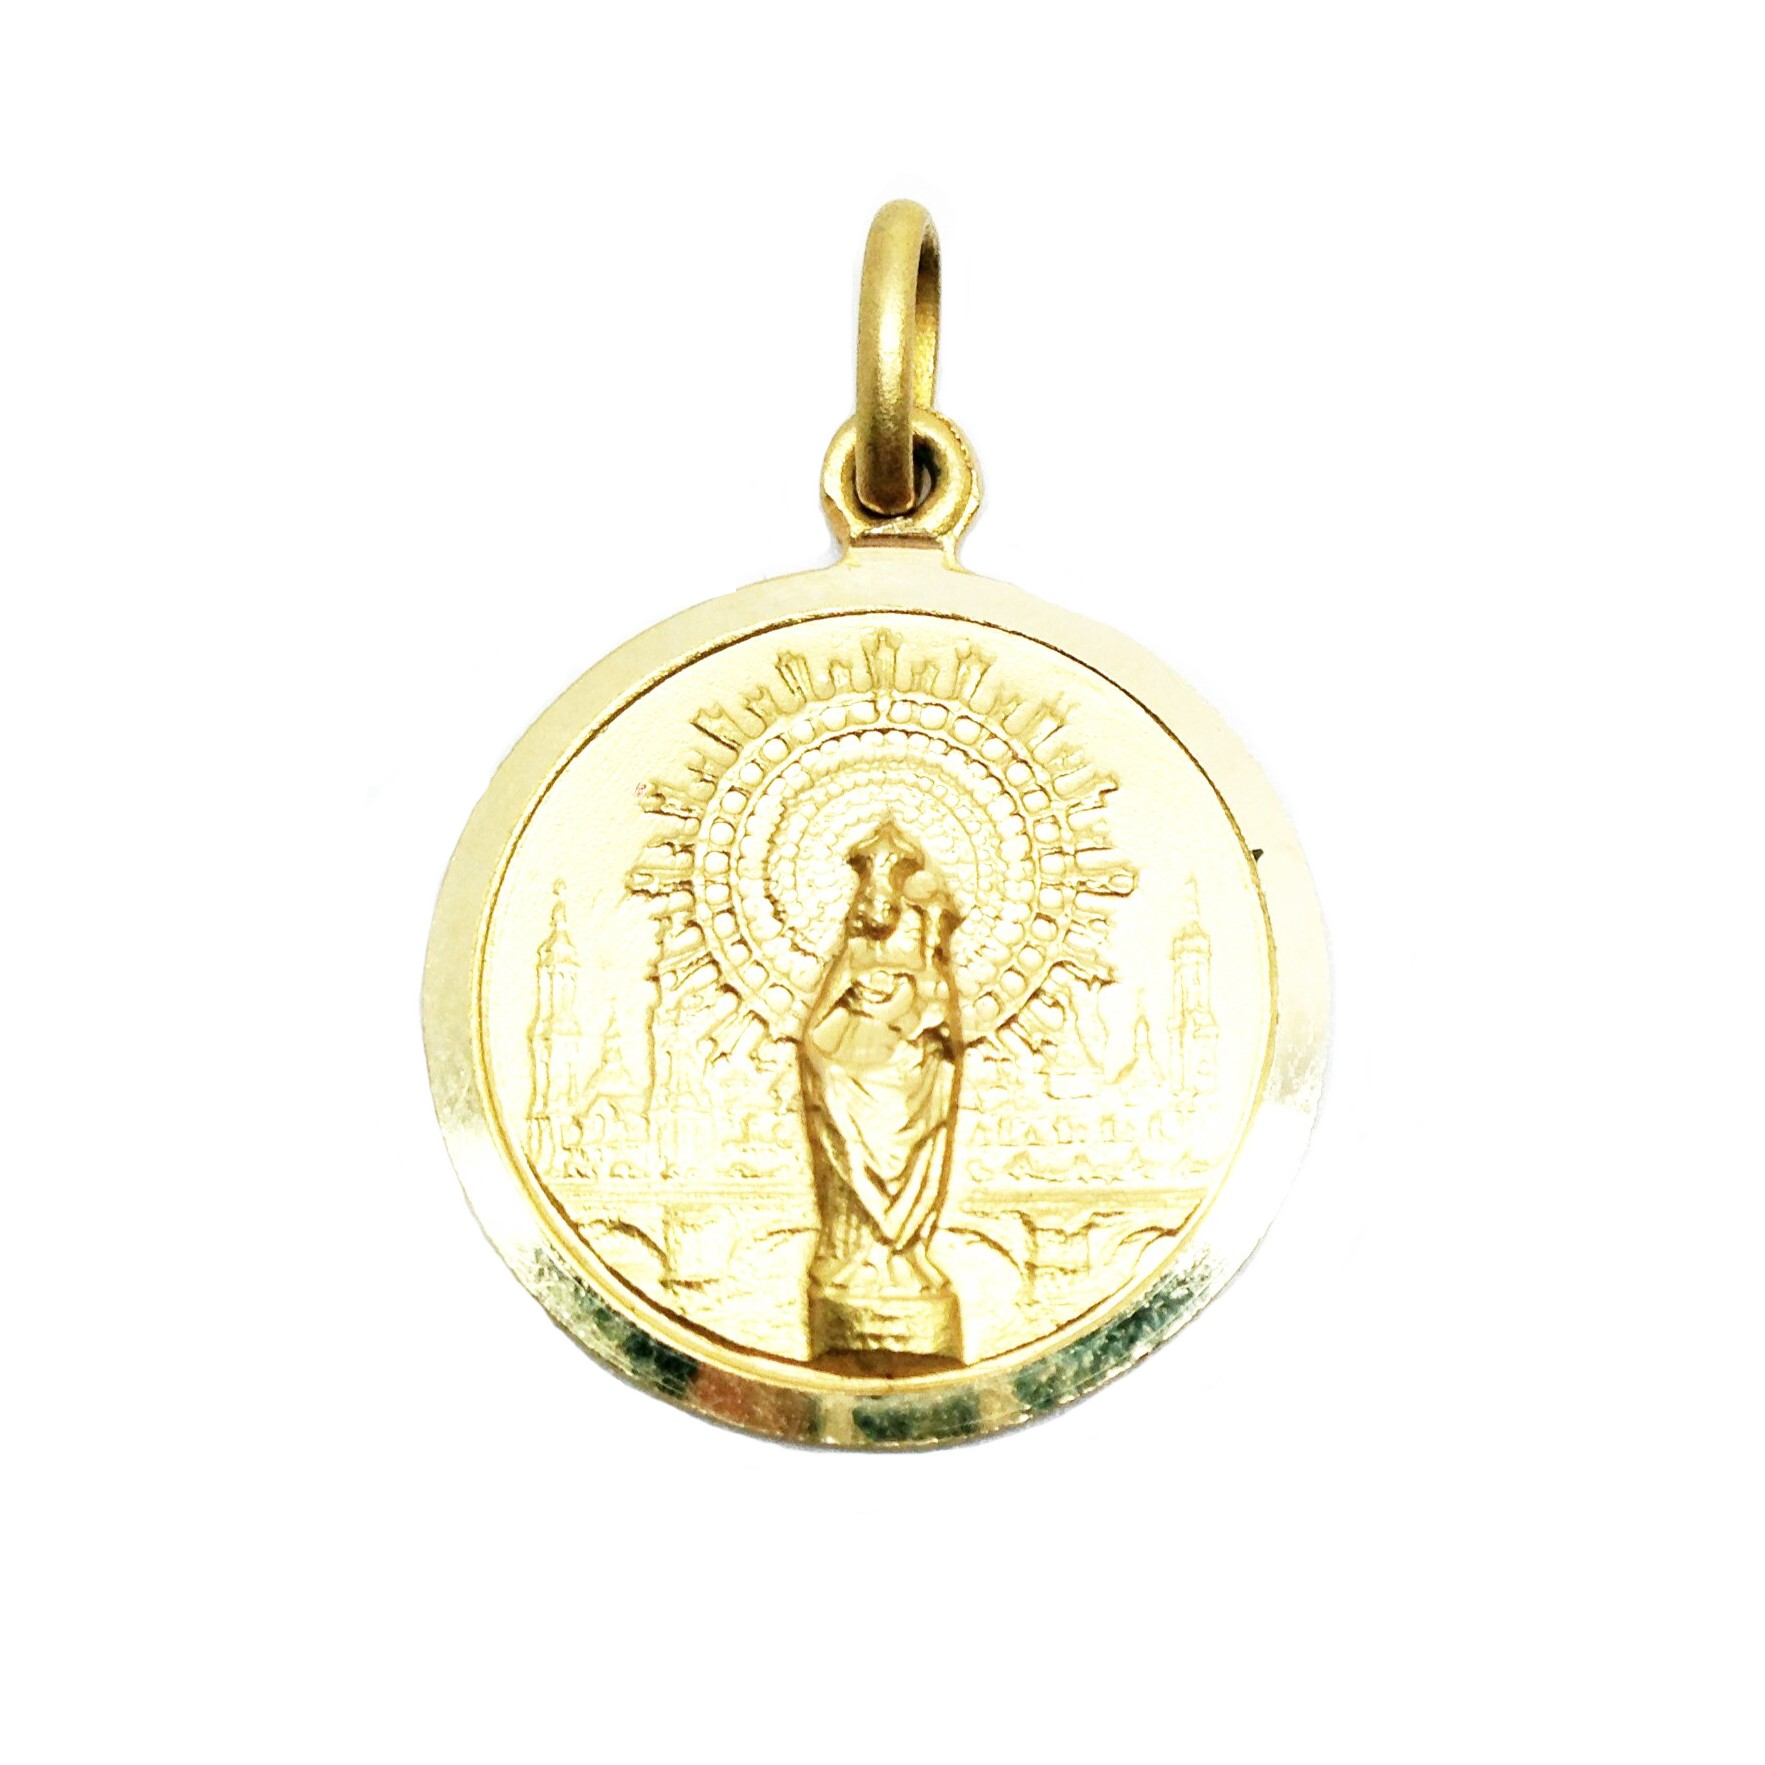 b7d9bfb13238 Medalla de oro virgen del pilar pilarica zaragoza joyería juan luis  larráyoz pamplona